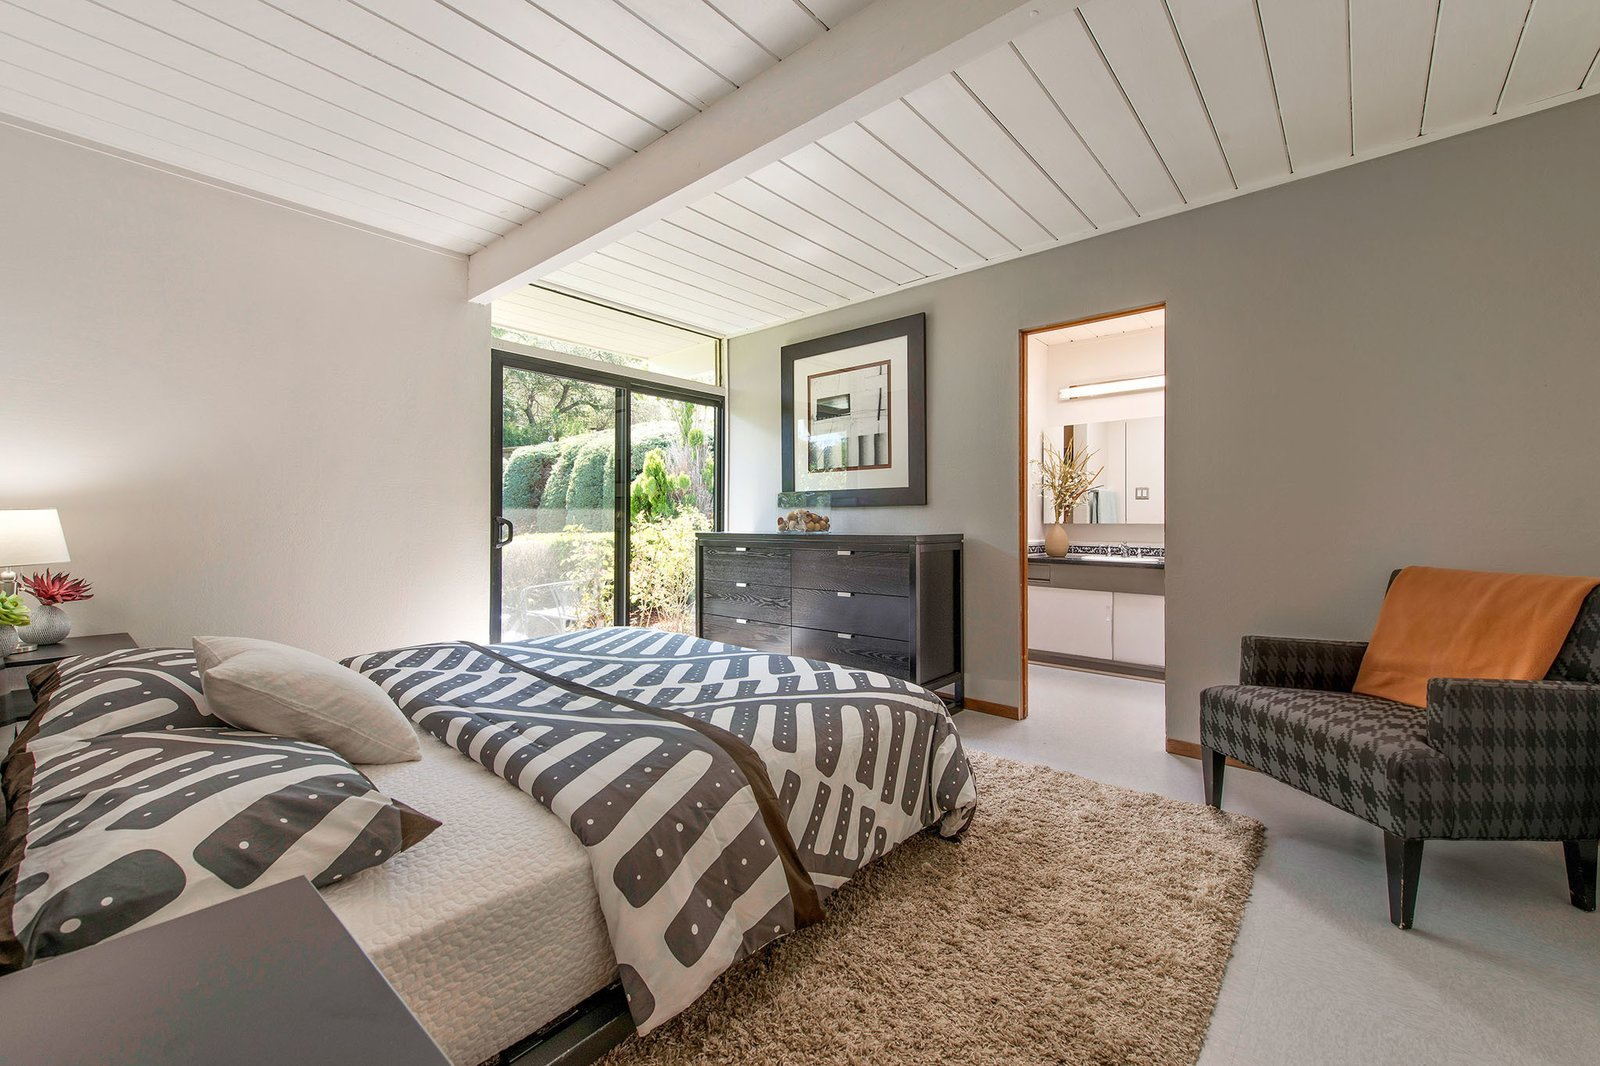 San Rafael Eichler Home bedroom